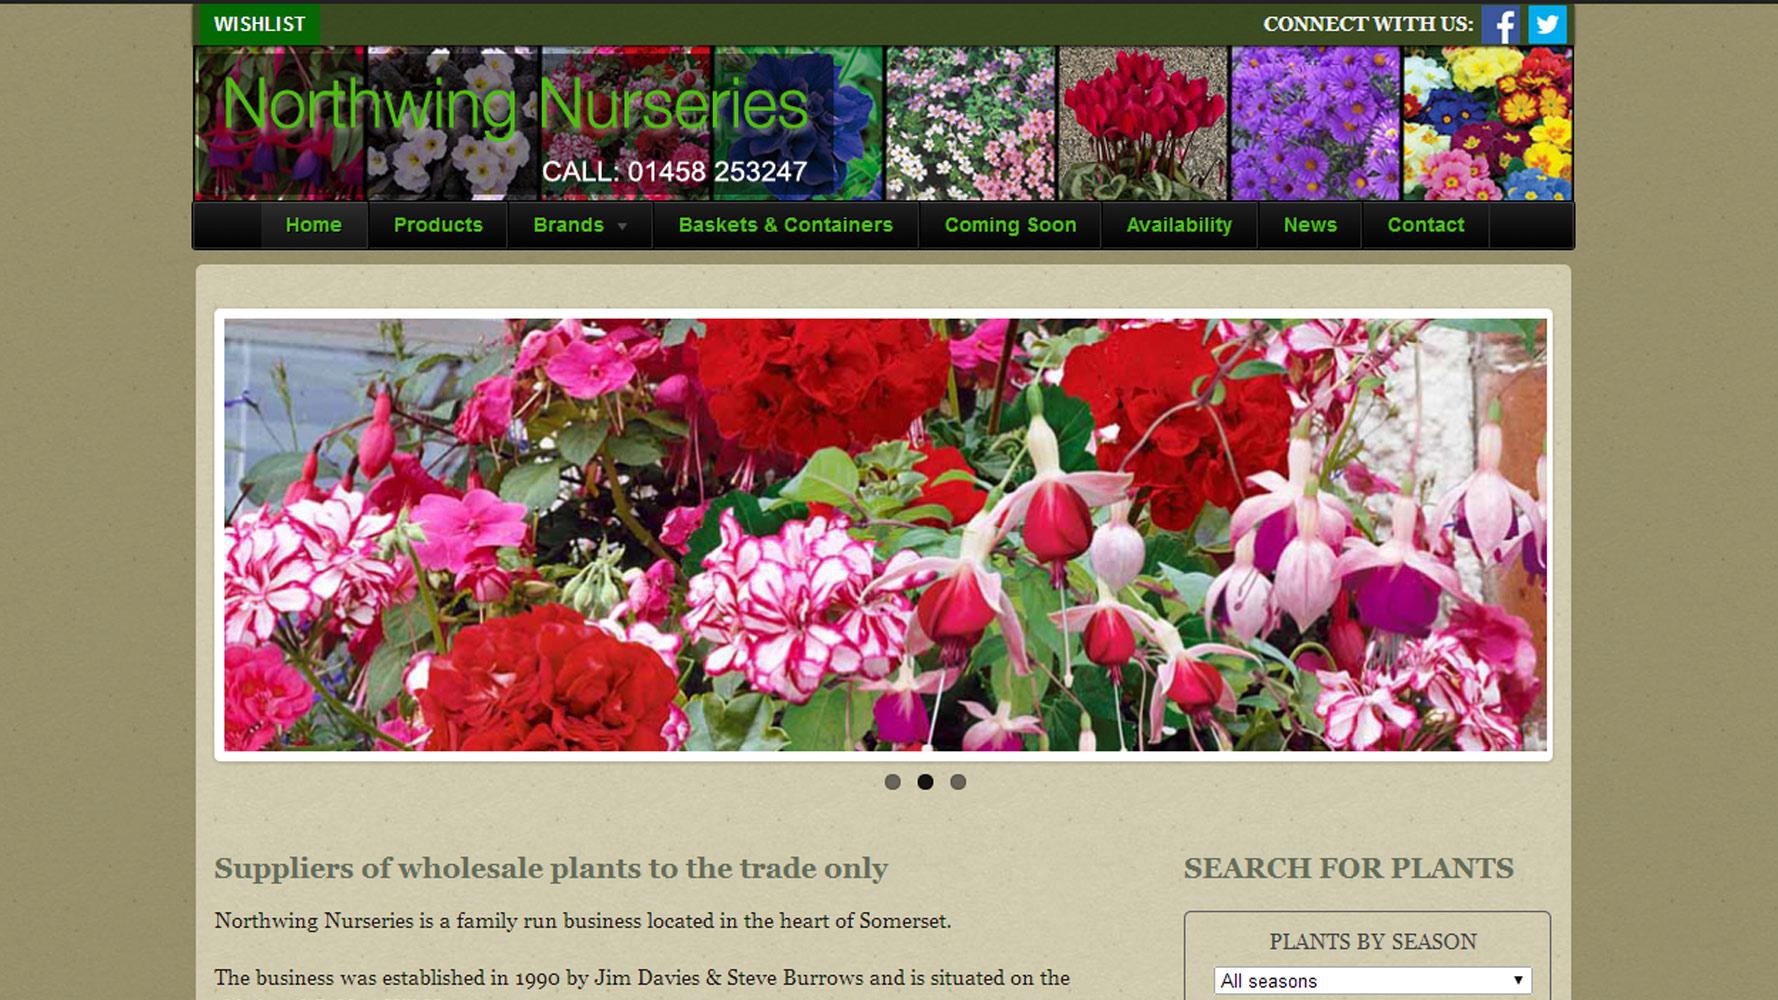 northwing nurseries screenshot by web adept